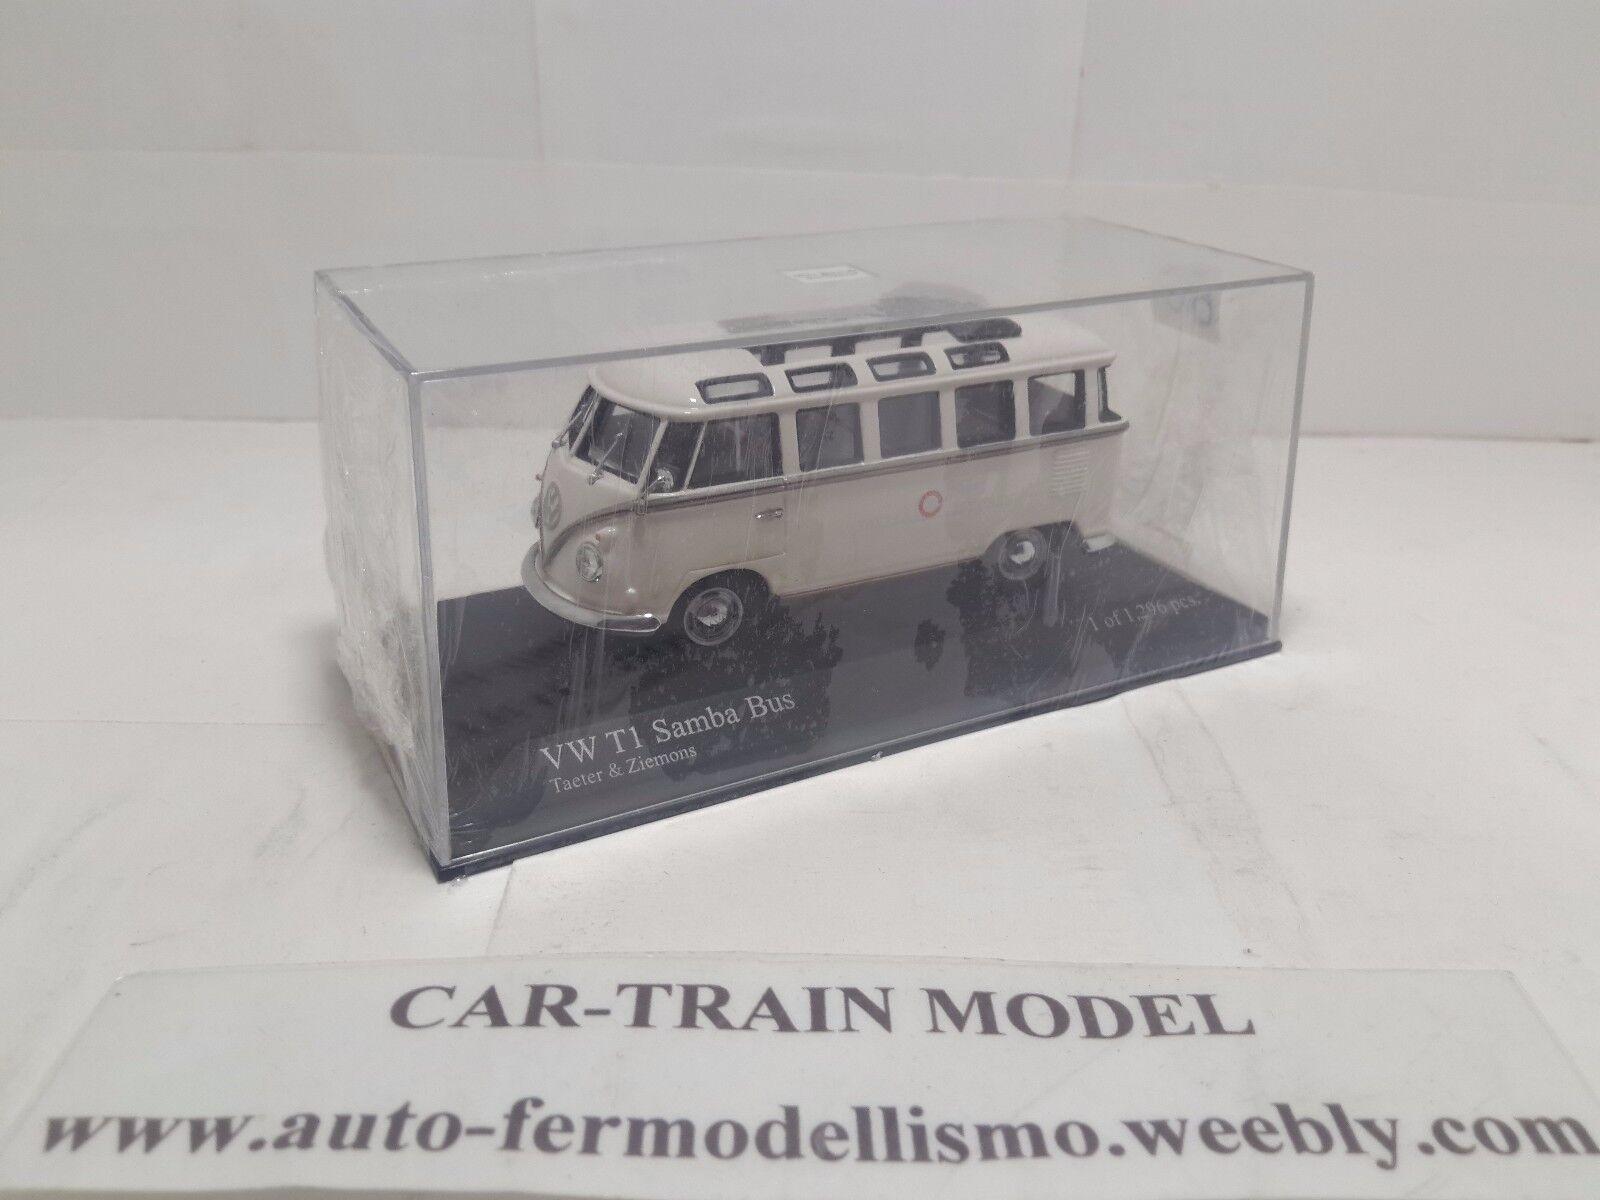 VW T1 Samba Bus  Taeter & Ziemons  - Minichamps - 1:43 1/43 1-43